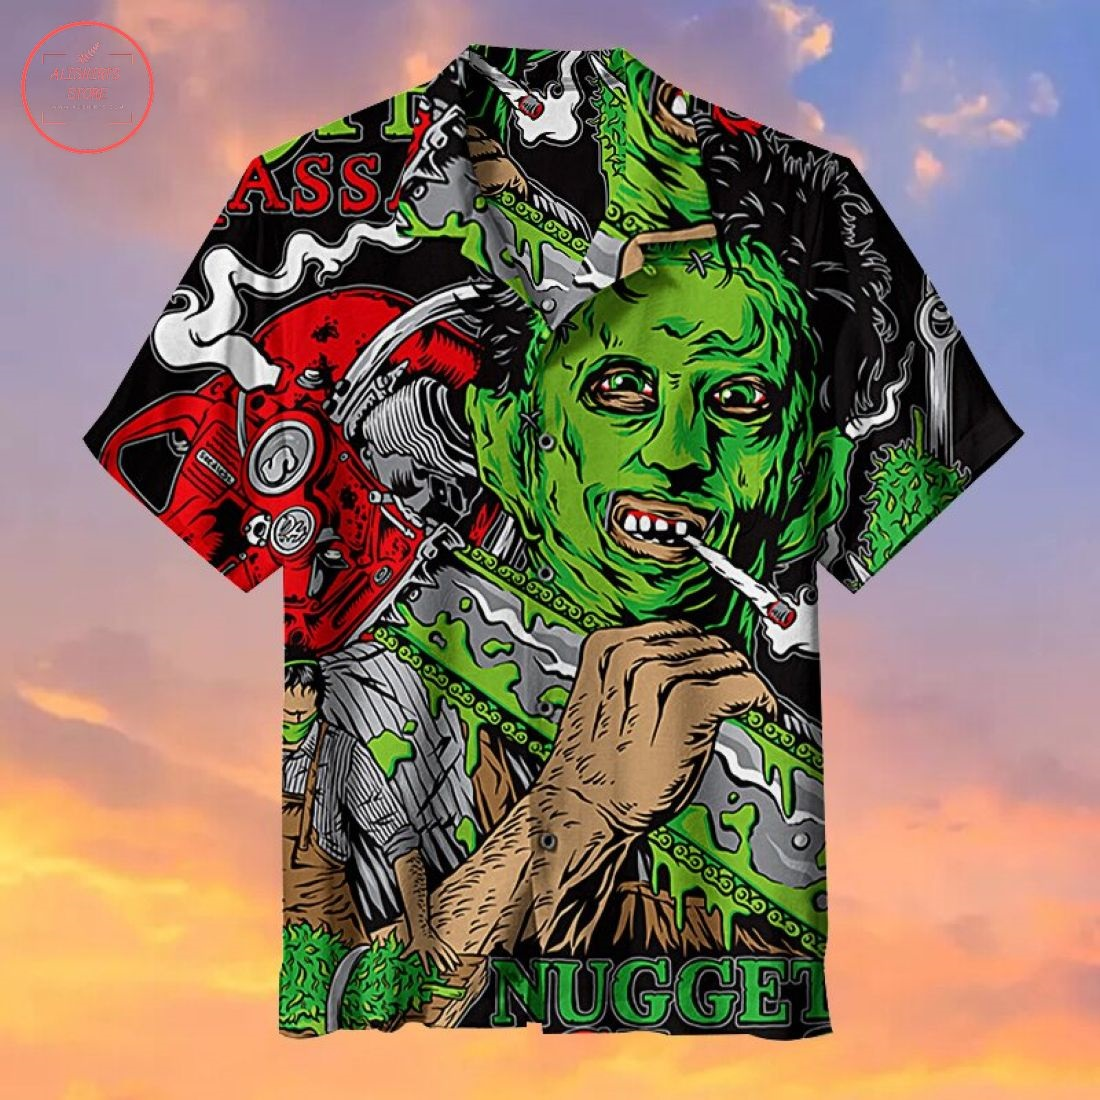 The Texas Chain Saw Massacre Hawaiian shirt